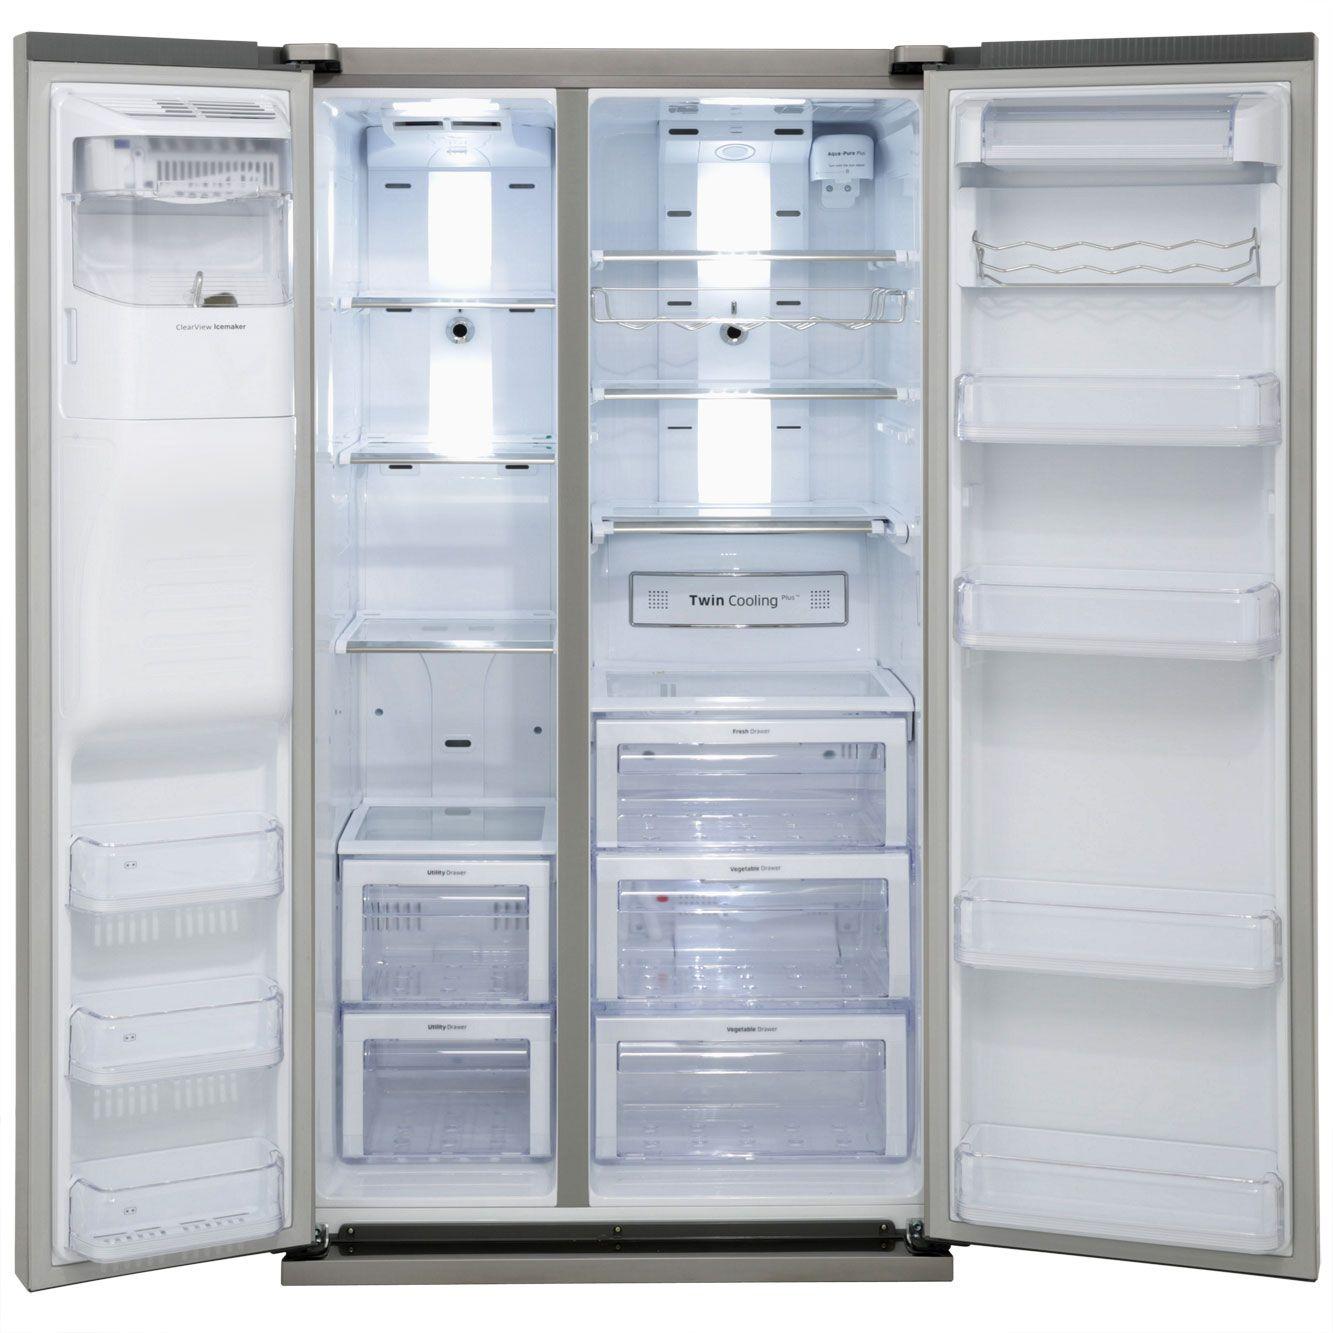 Large Capacity American Fridge Freezer Part - 20: Samsung American Fridge Freezer | RSG5UCRS | Ao.com